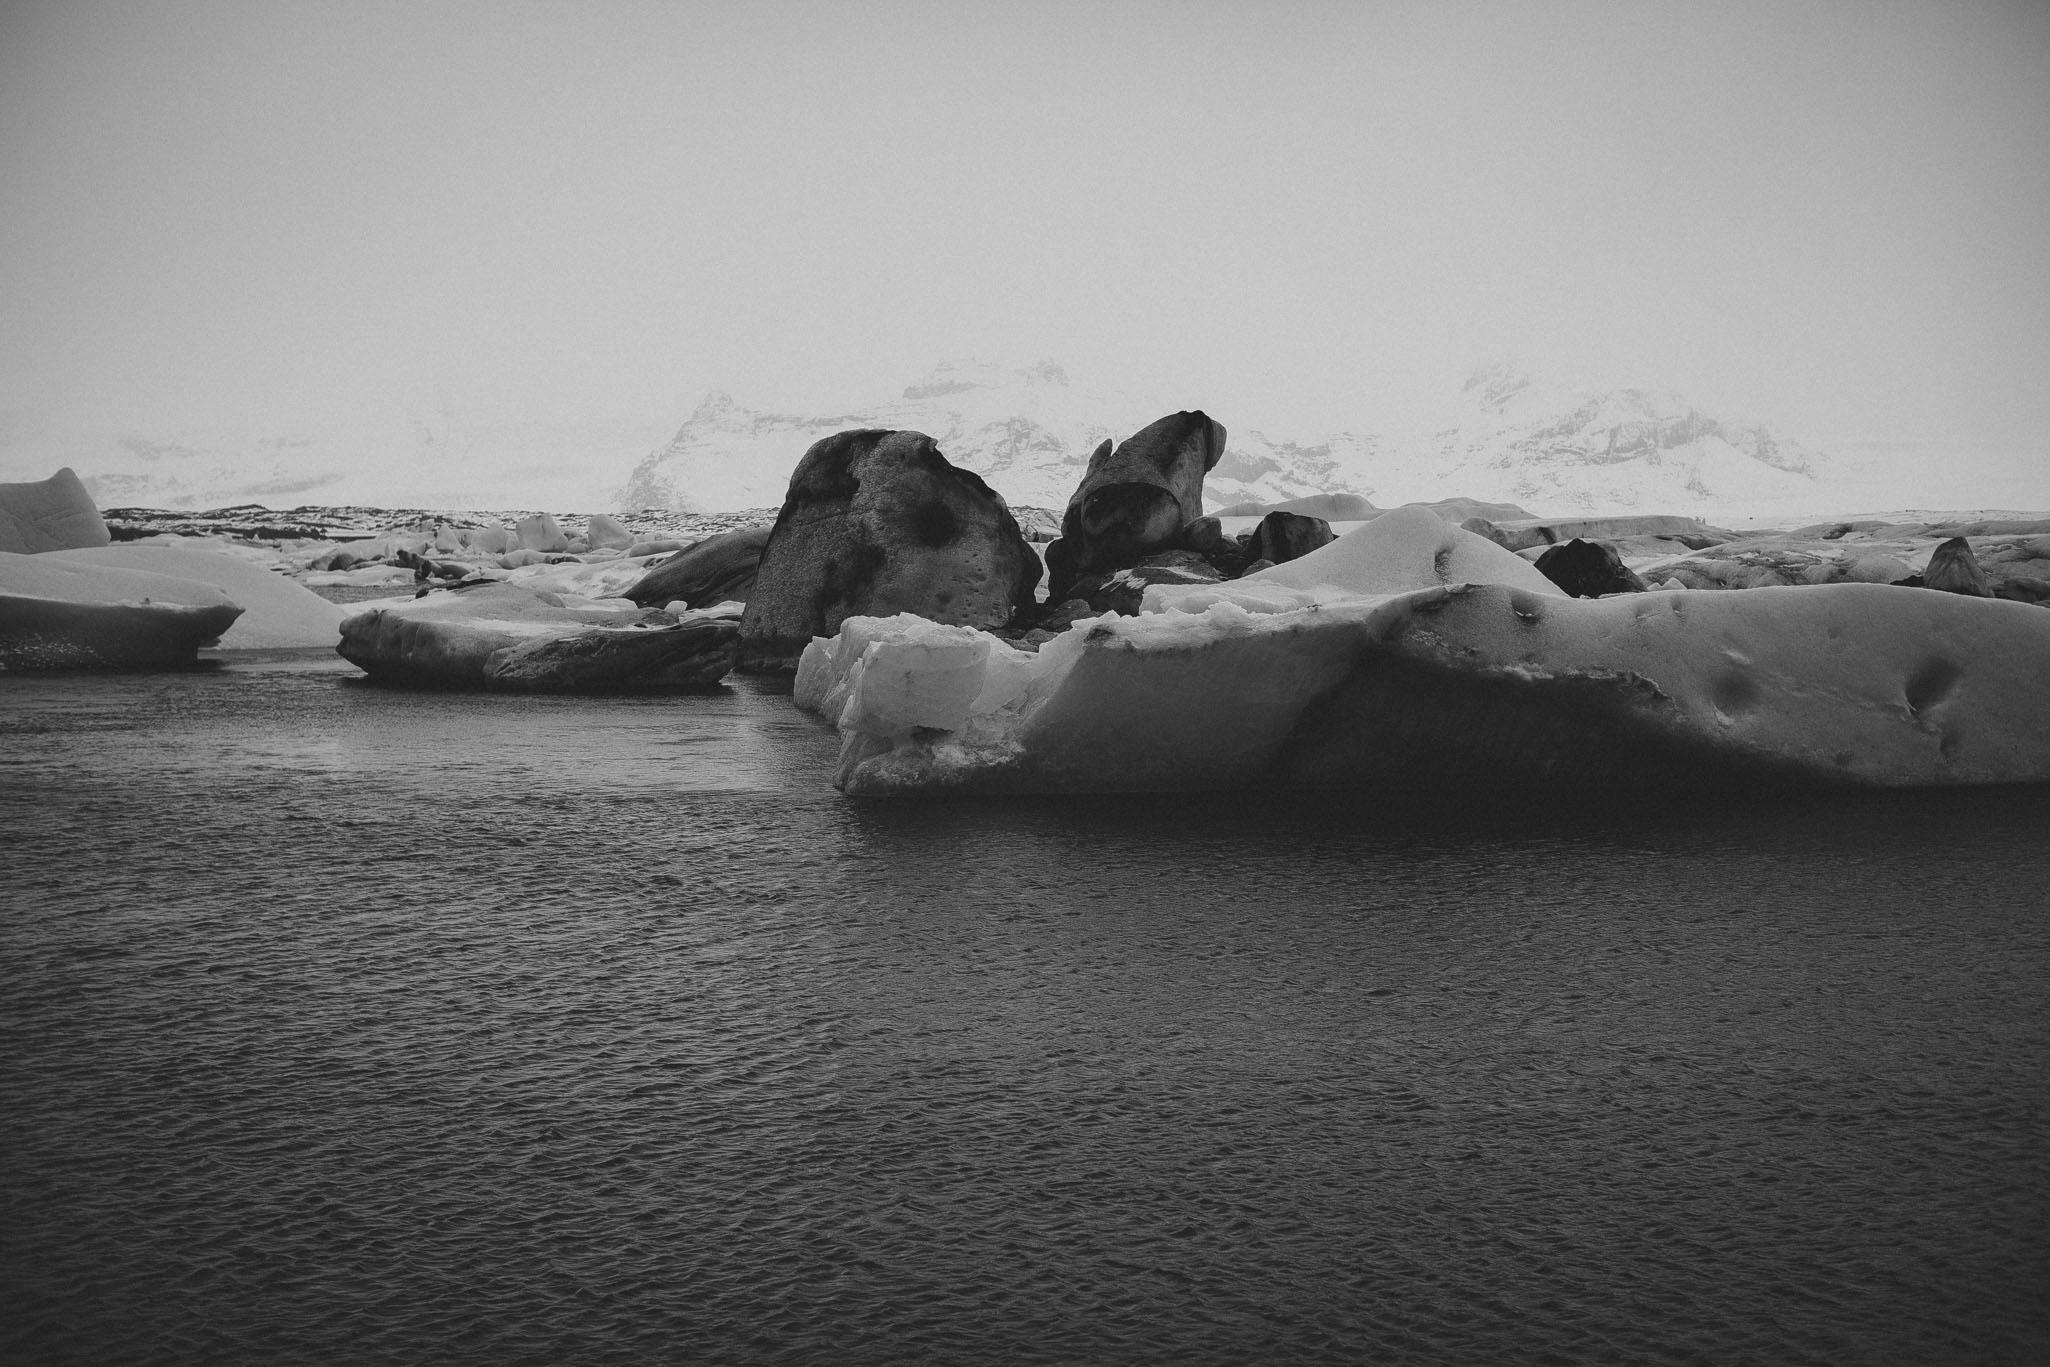 Road-trip-Islande-Iceland-Voyage-Travel-Portrait-Jérémy-Boyer-Jokulsarlon-Ice-Beach-plage-glace-4.jpg